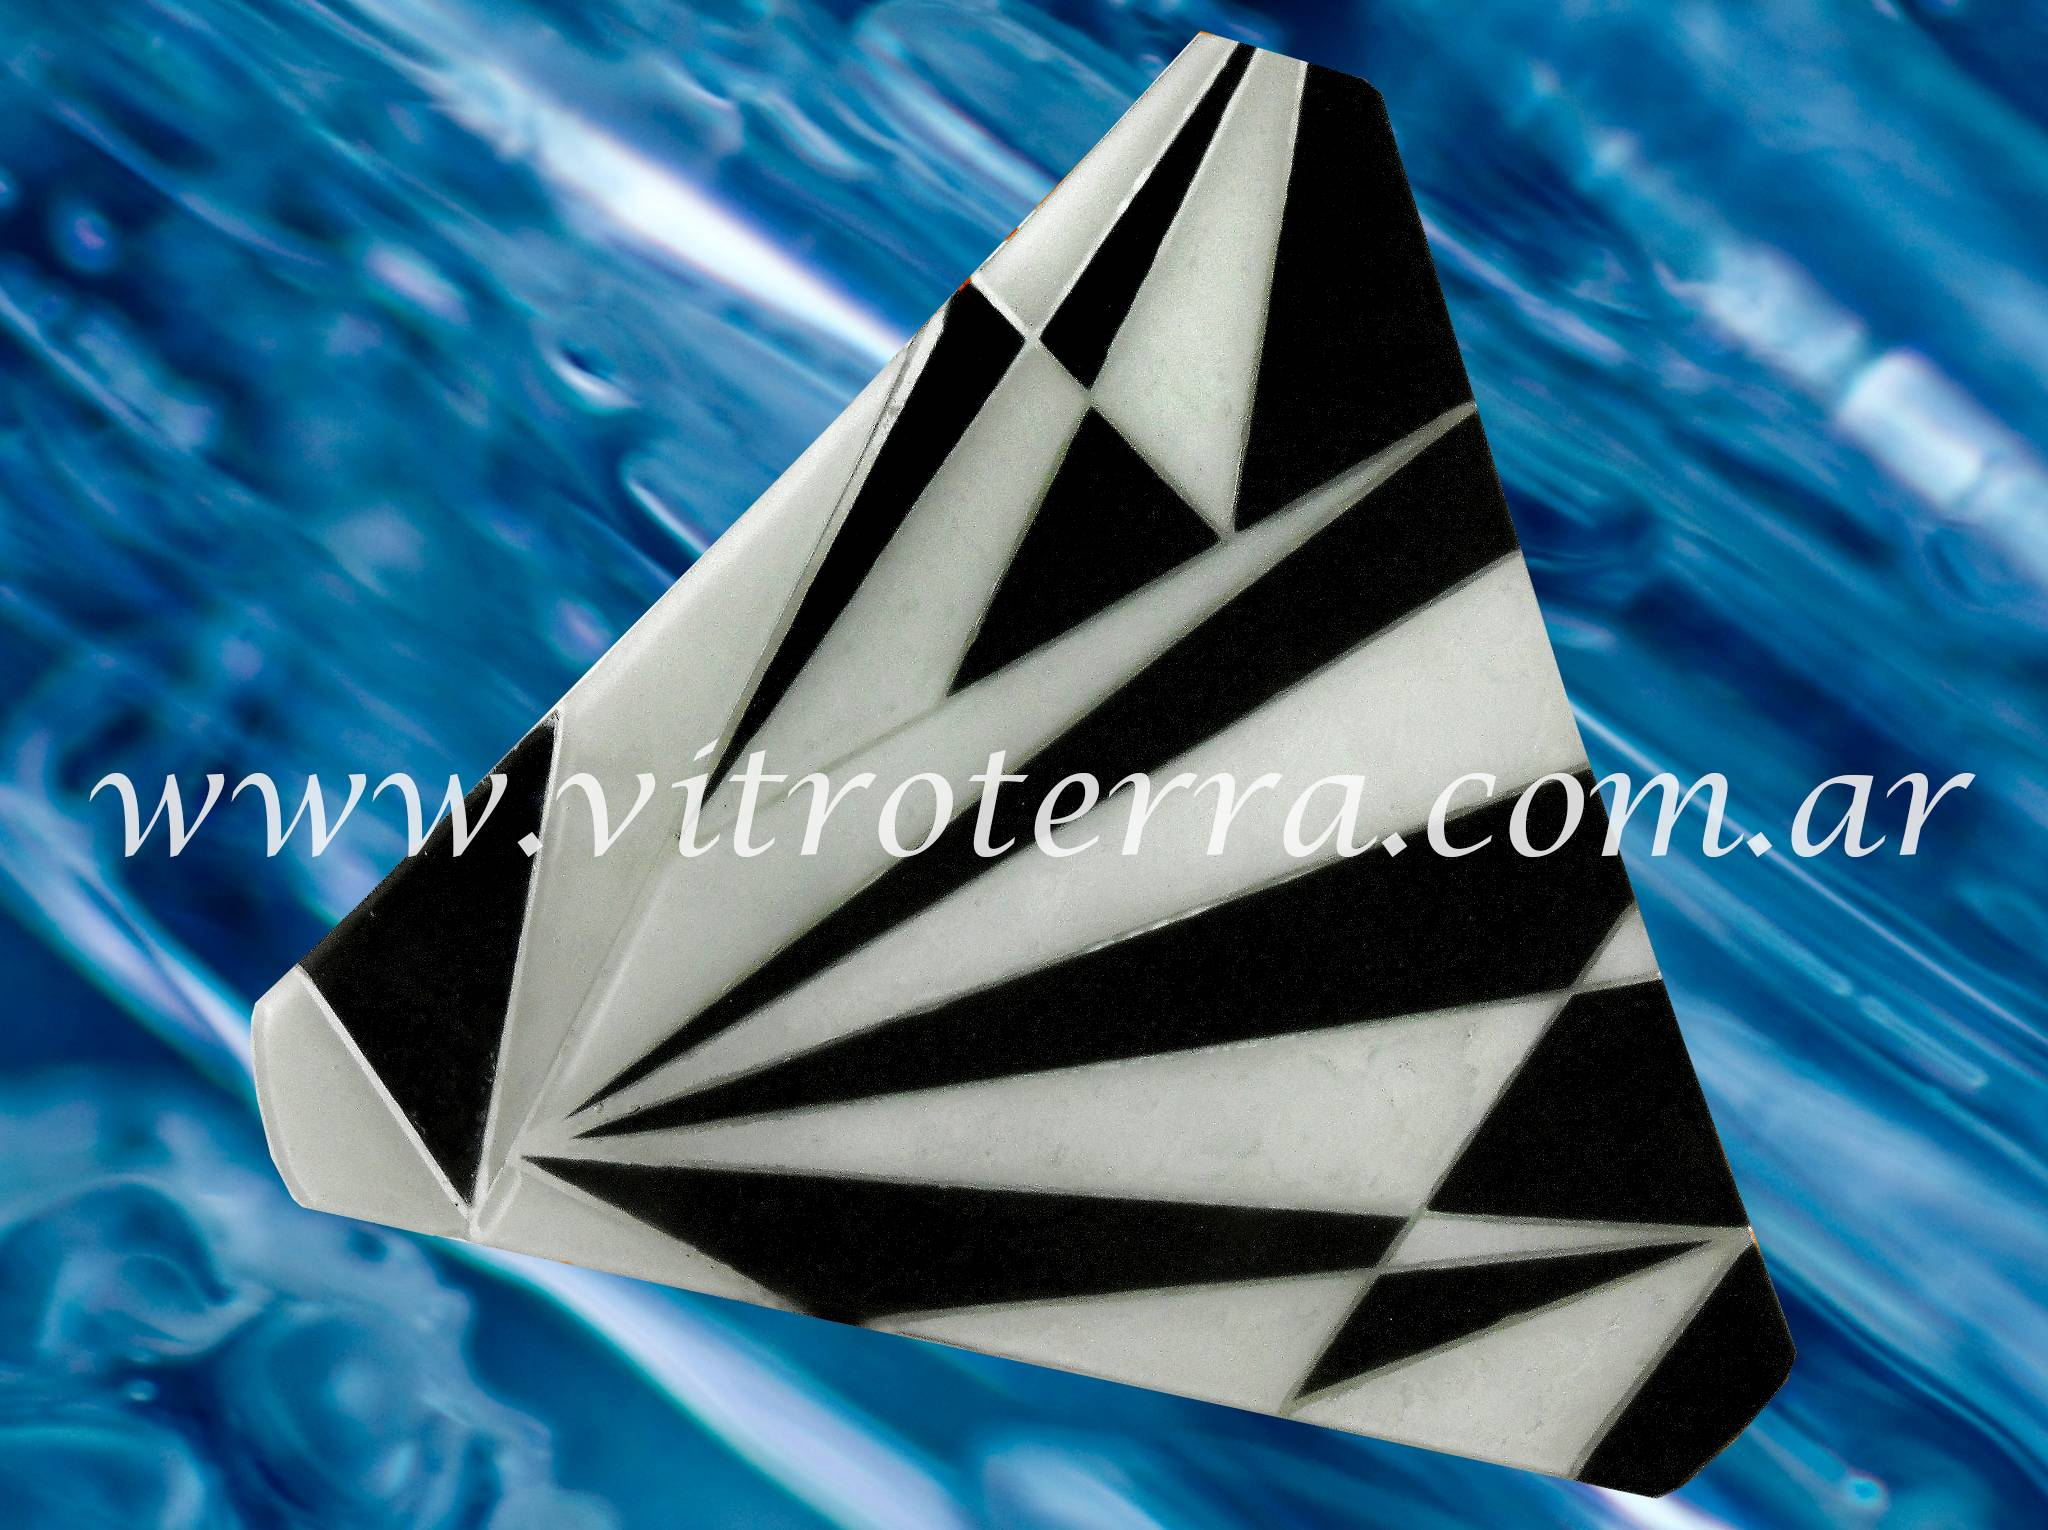 Centro irregular de vidrio Trigonometría